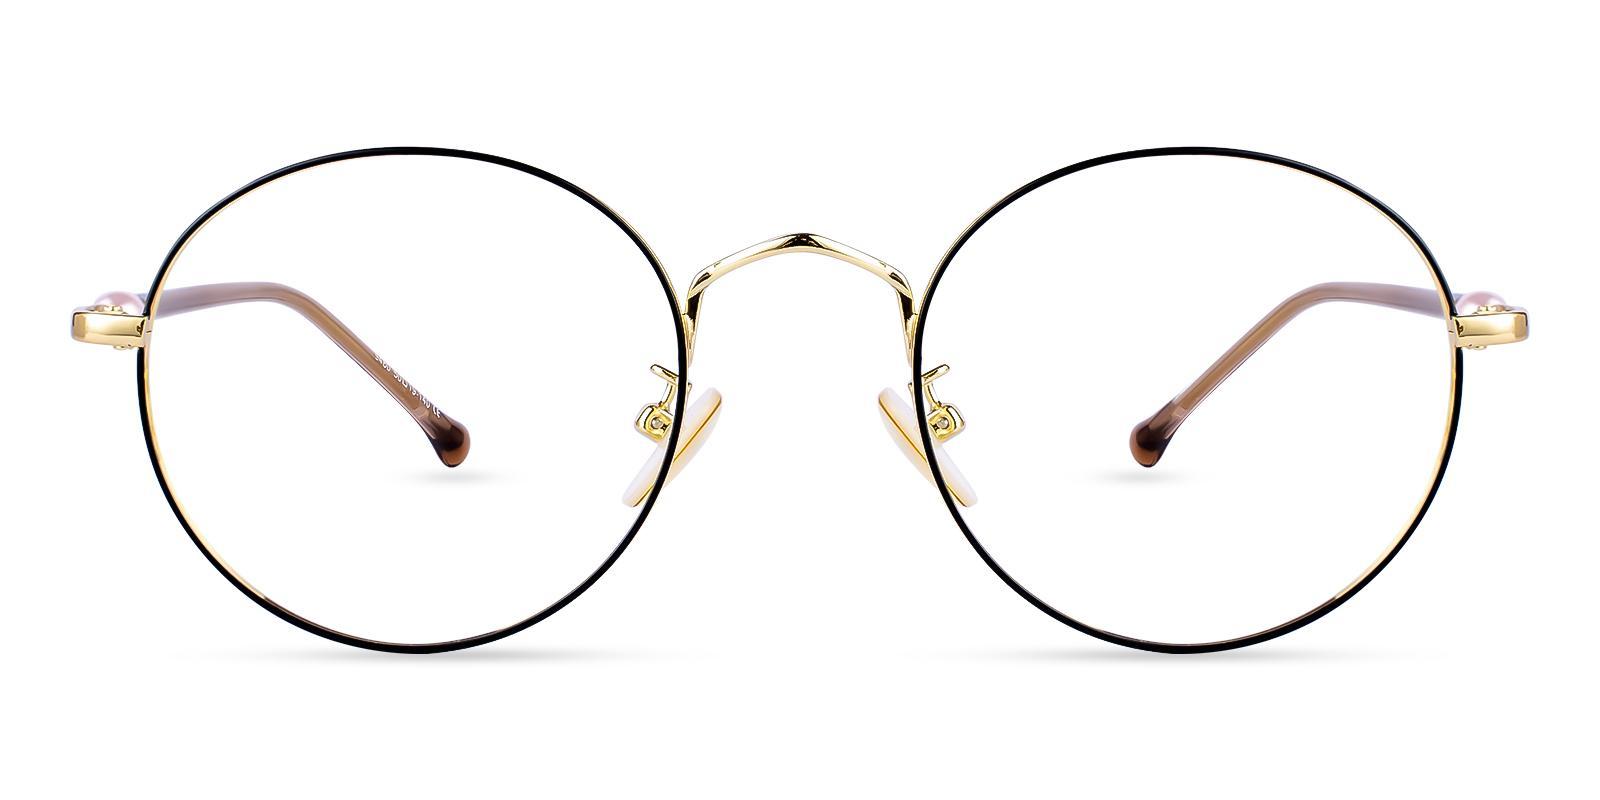 Durns Gold Metal Eyeglasses , NosePads Frames from ABBE Glasses